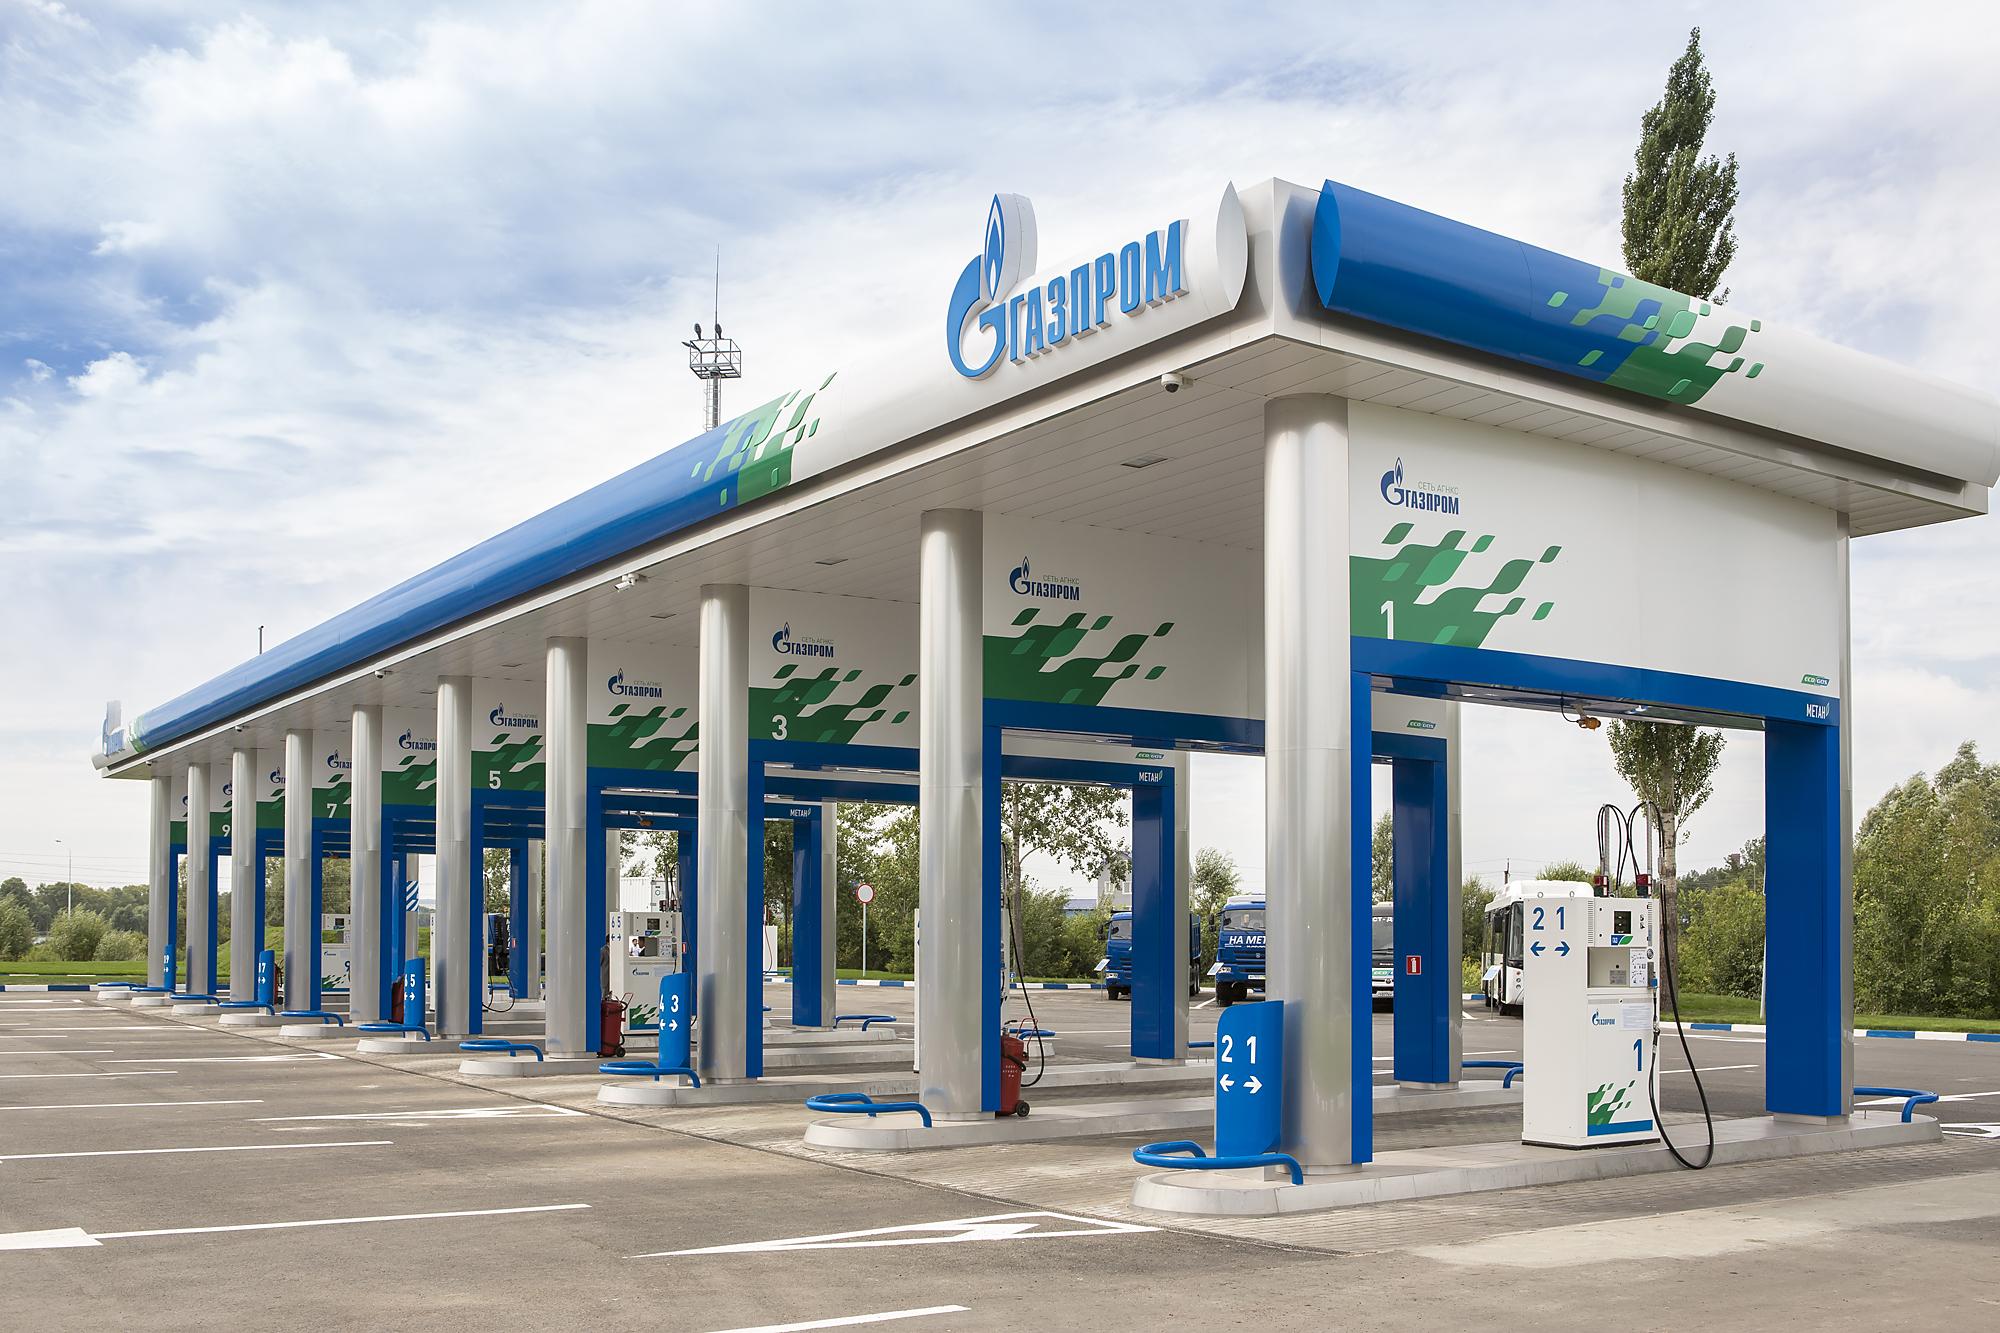 бар газомоторное топливо газпром картинки славянский символ